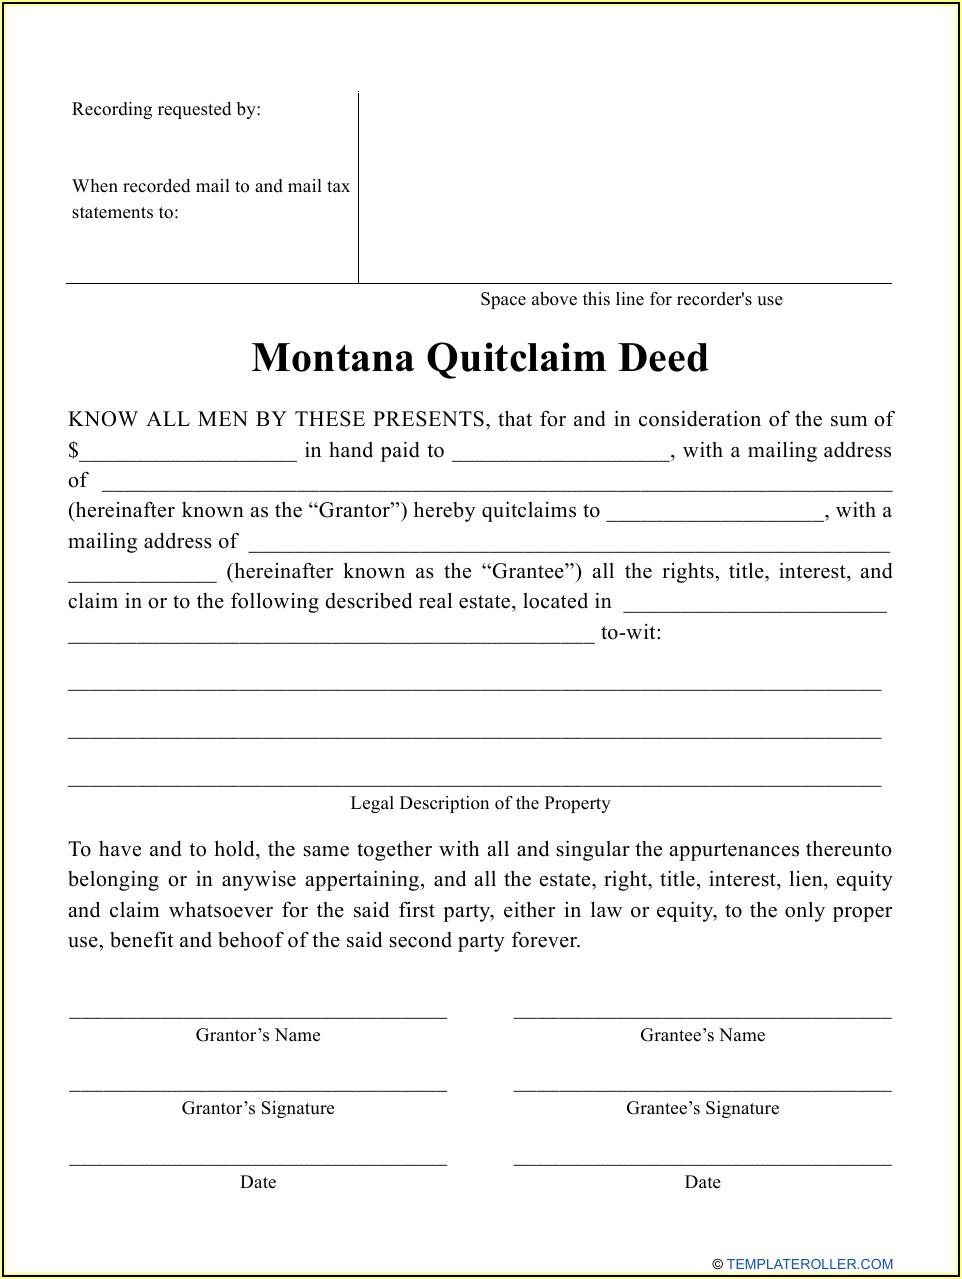 Printable Blank Quit Claim Deed Form